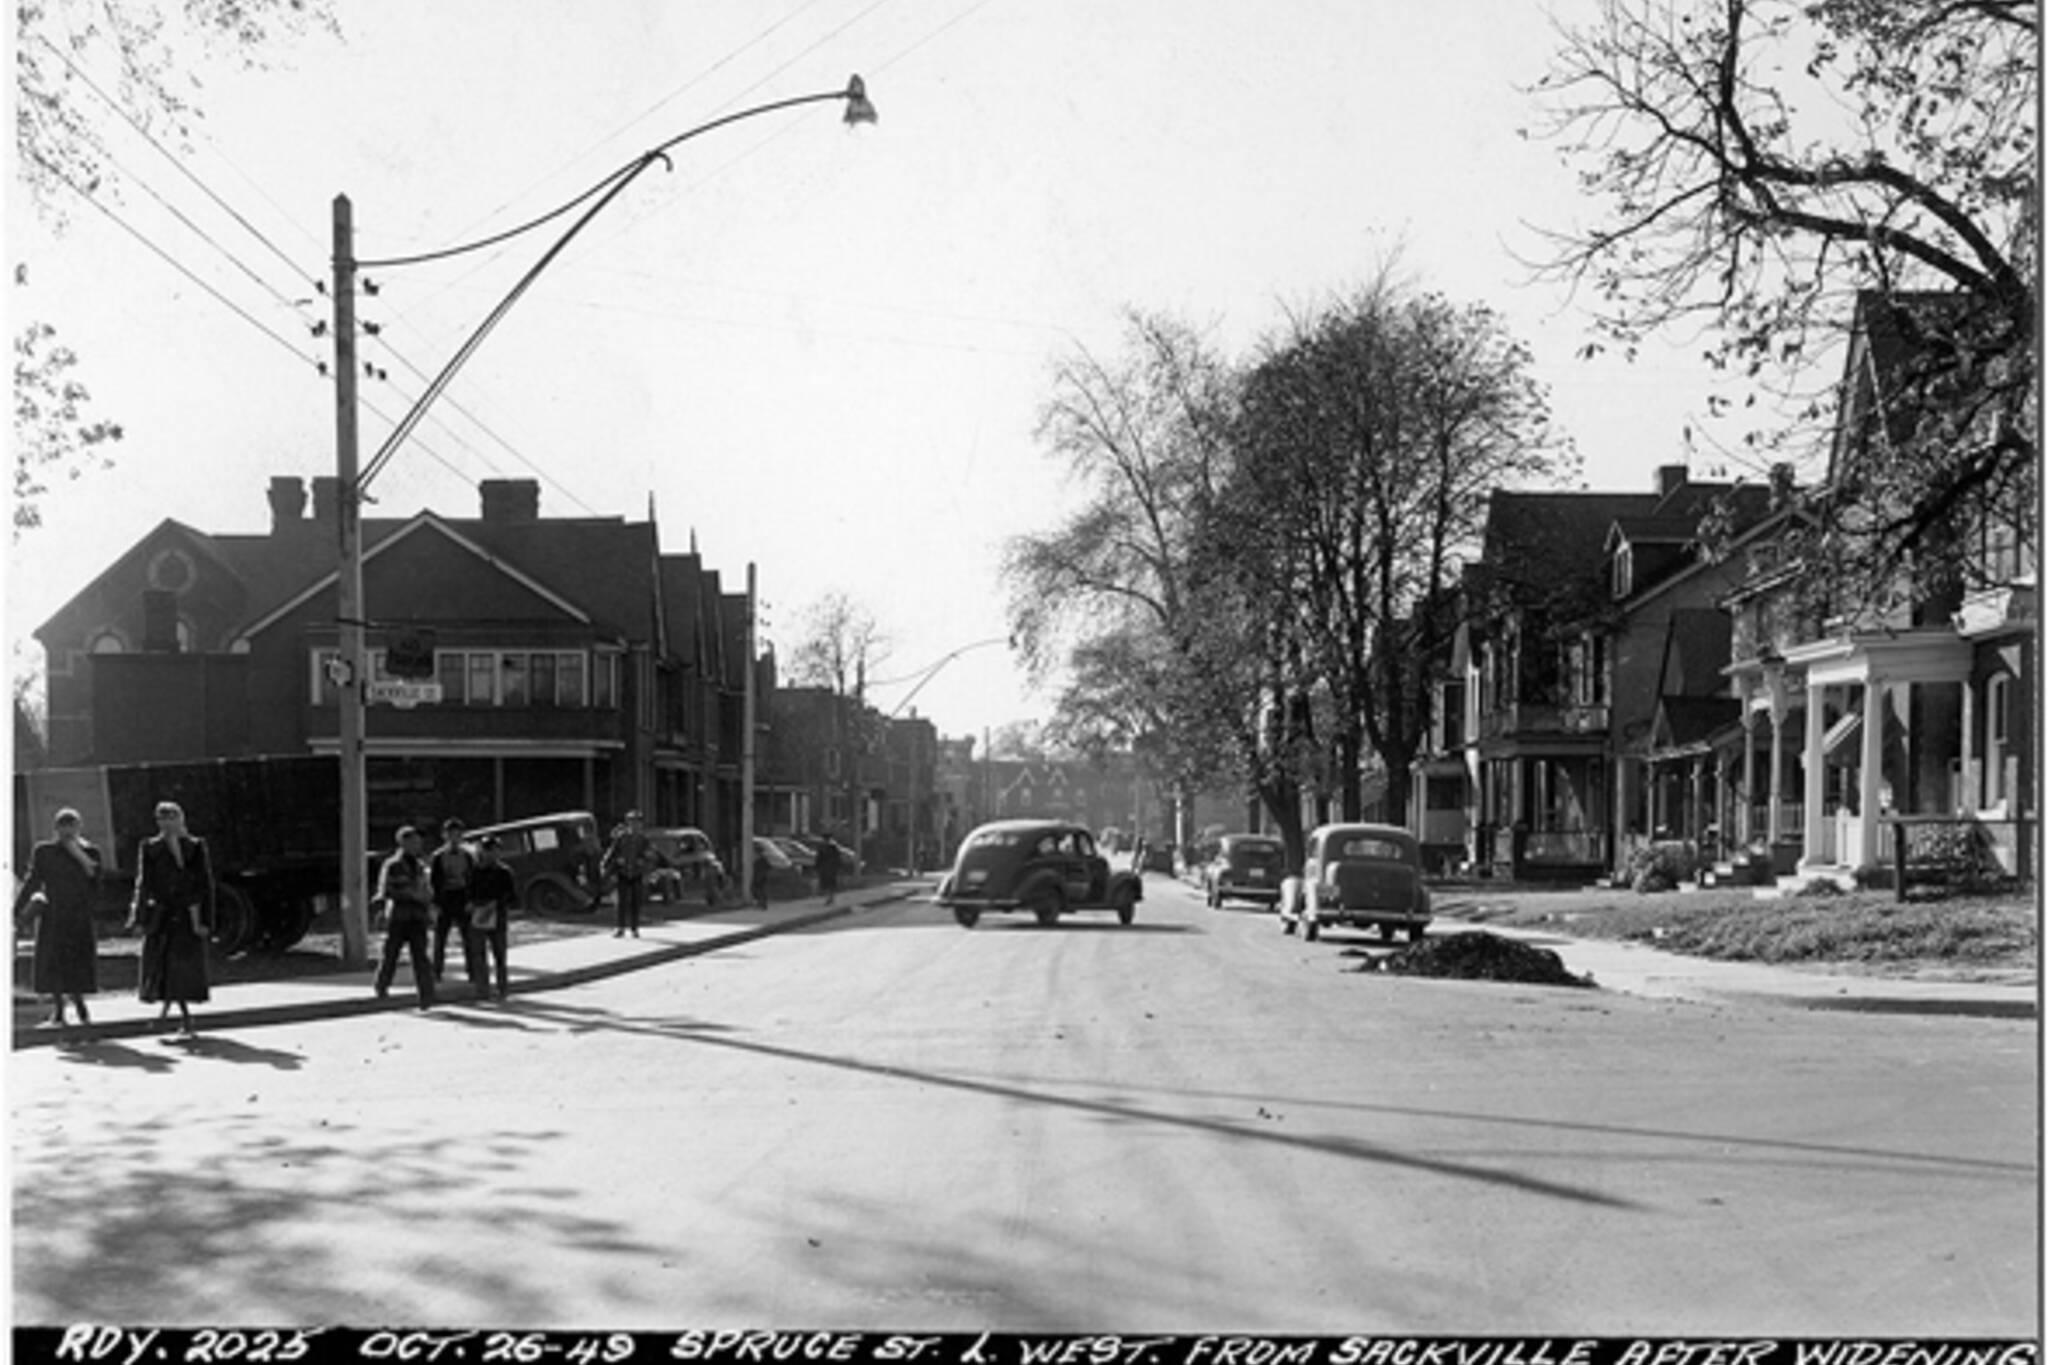 Toronto, Cabbagetown, Don Vale, Spruce Street, Sackville Street, Victorian architecture, gentrification, urban renewal, 1949